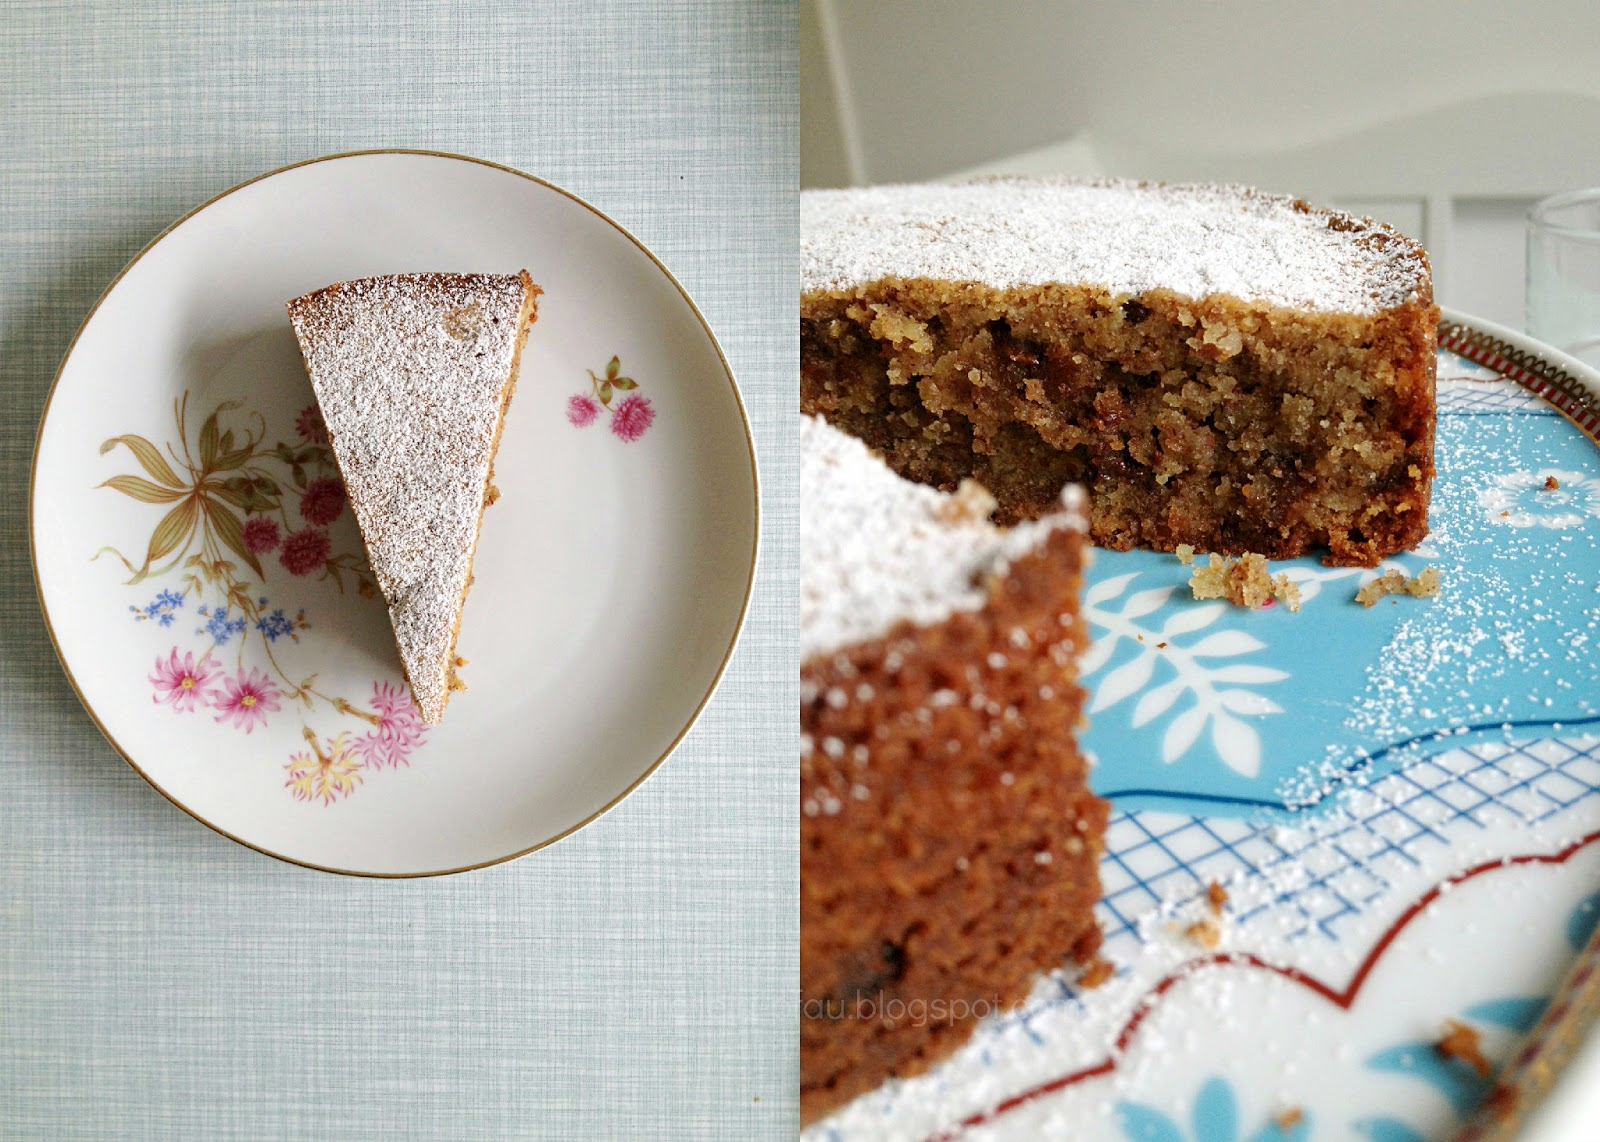 Kuchen, Rezept, Kaffeeklatsch, Nusskuchen, Mandelkuchen, lecker